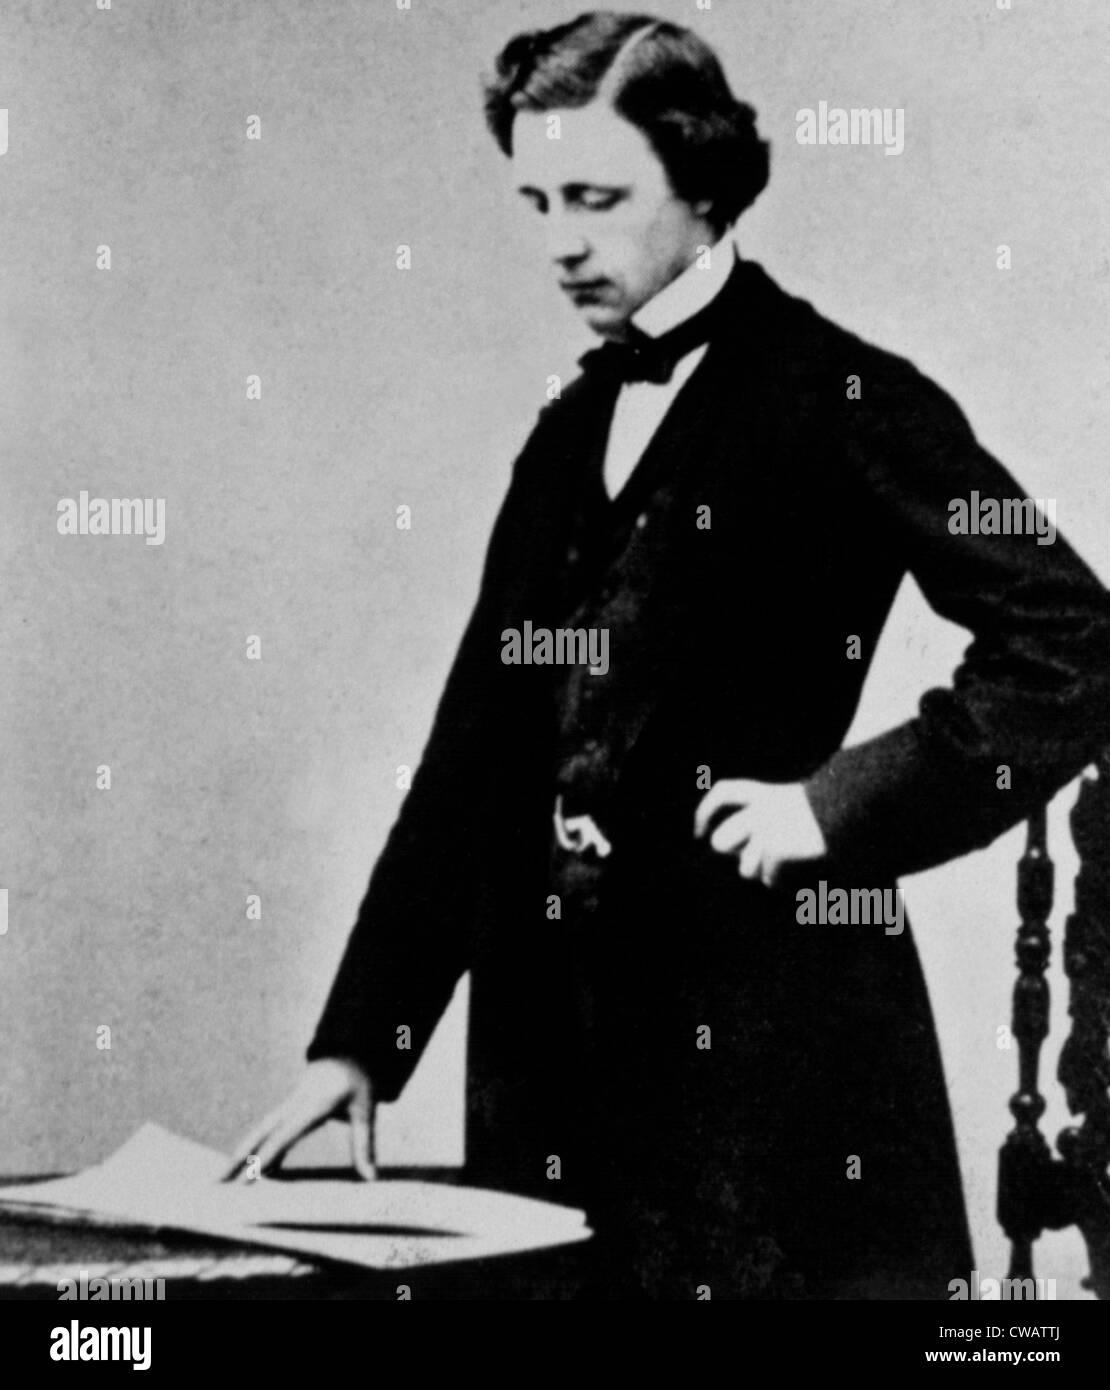 LEWIS CARROLL, (Charles Lutwidge Dogson) at 25. Author of Alice Wonderland, 1857. Courtesy: CSU Archives / Everett - Stock Image